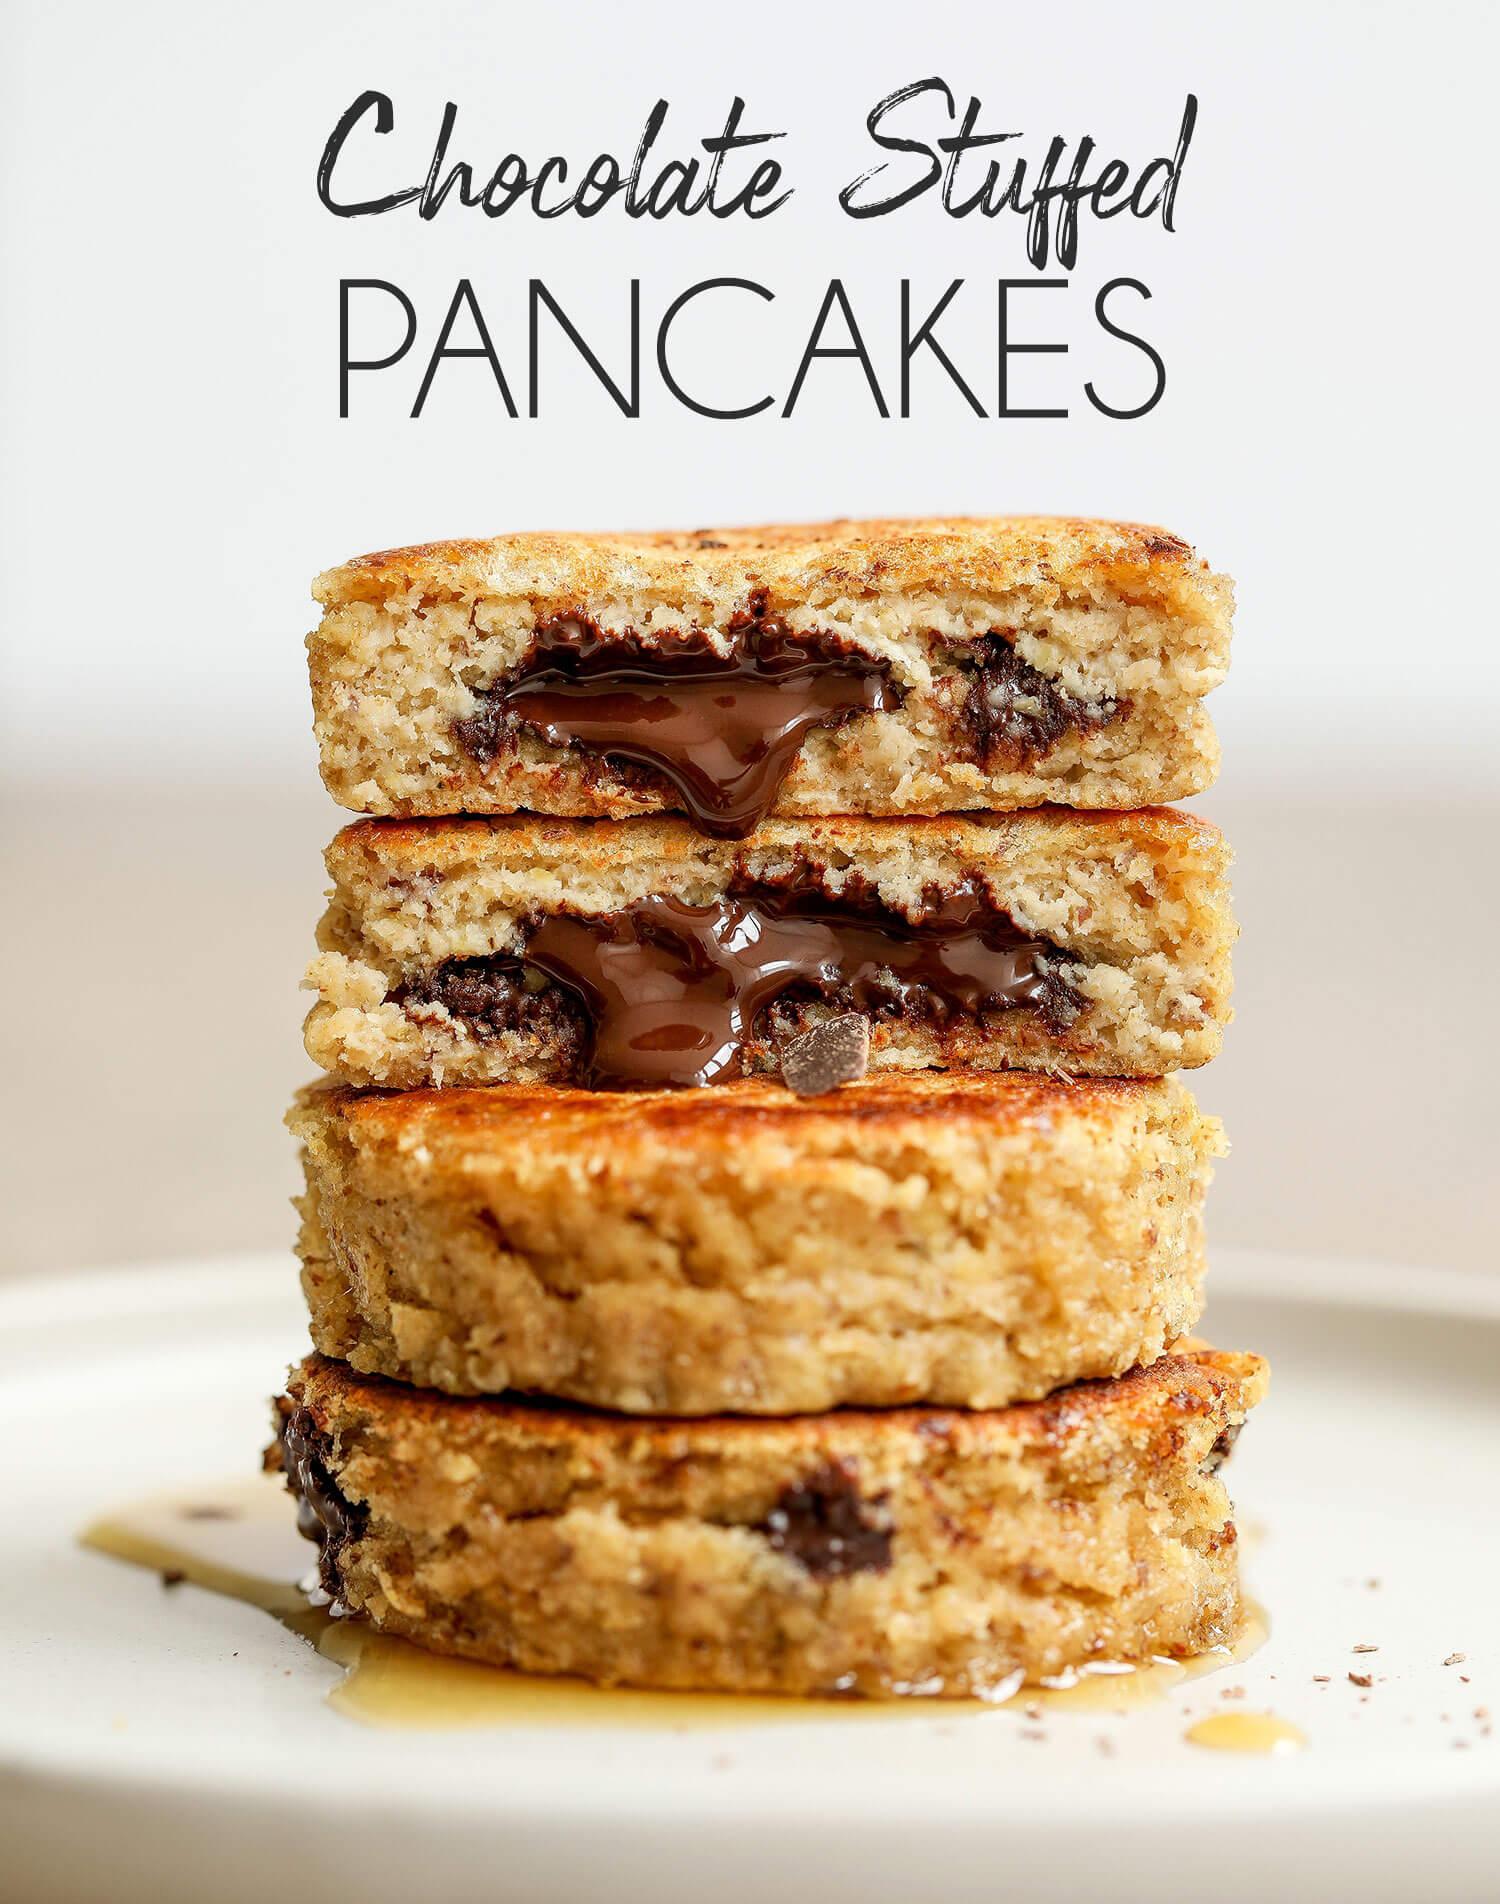 Vegan & Gluten-free Chocolate Stuffed Pancakes